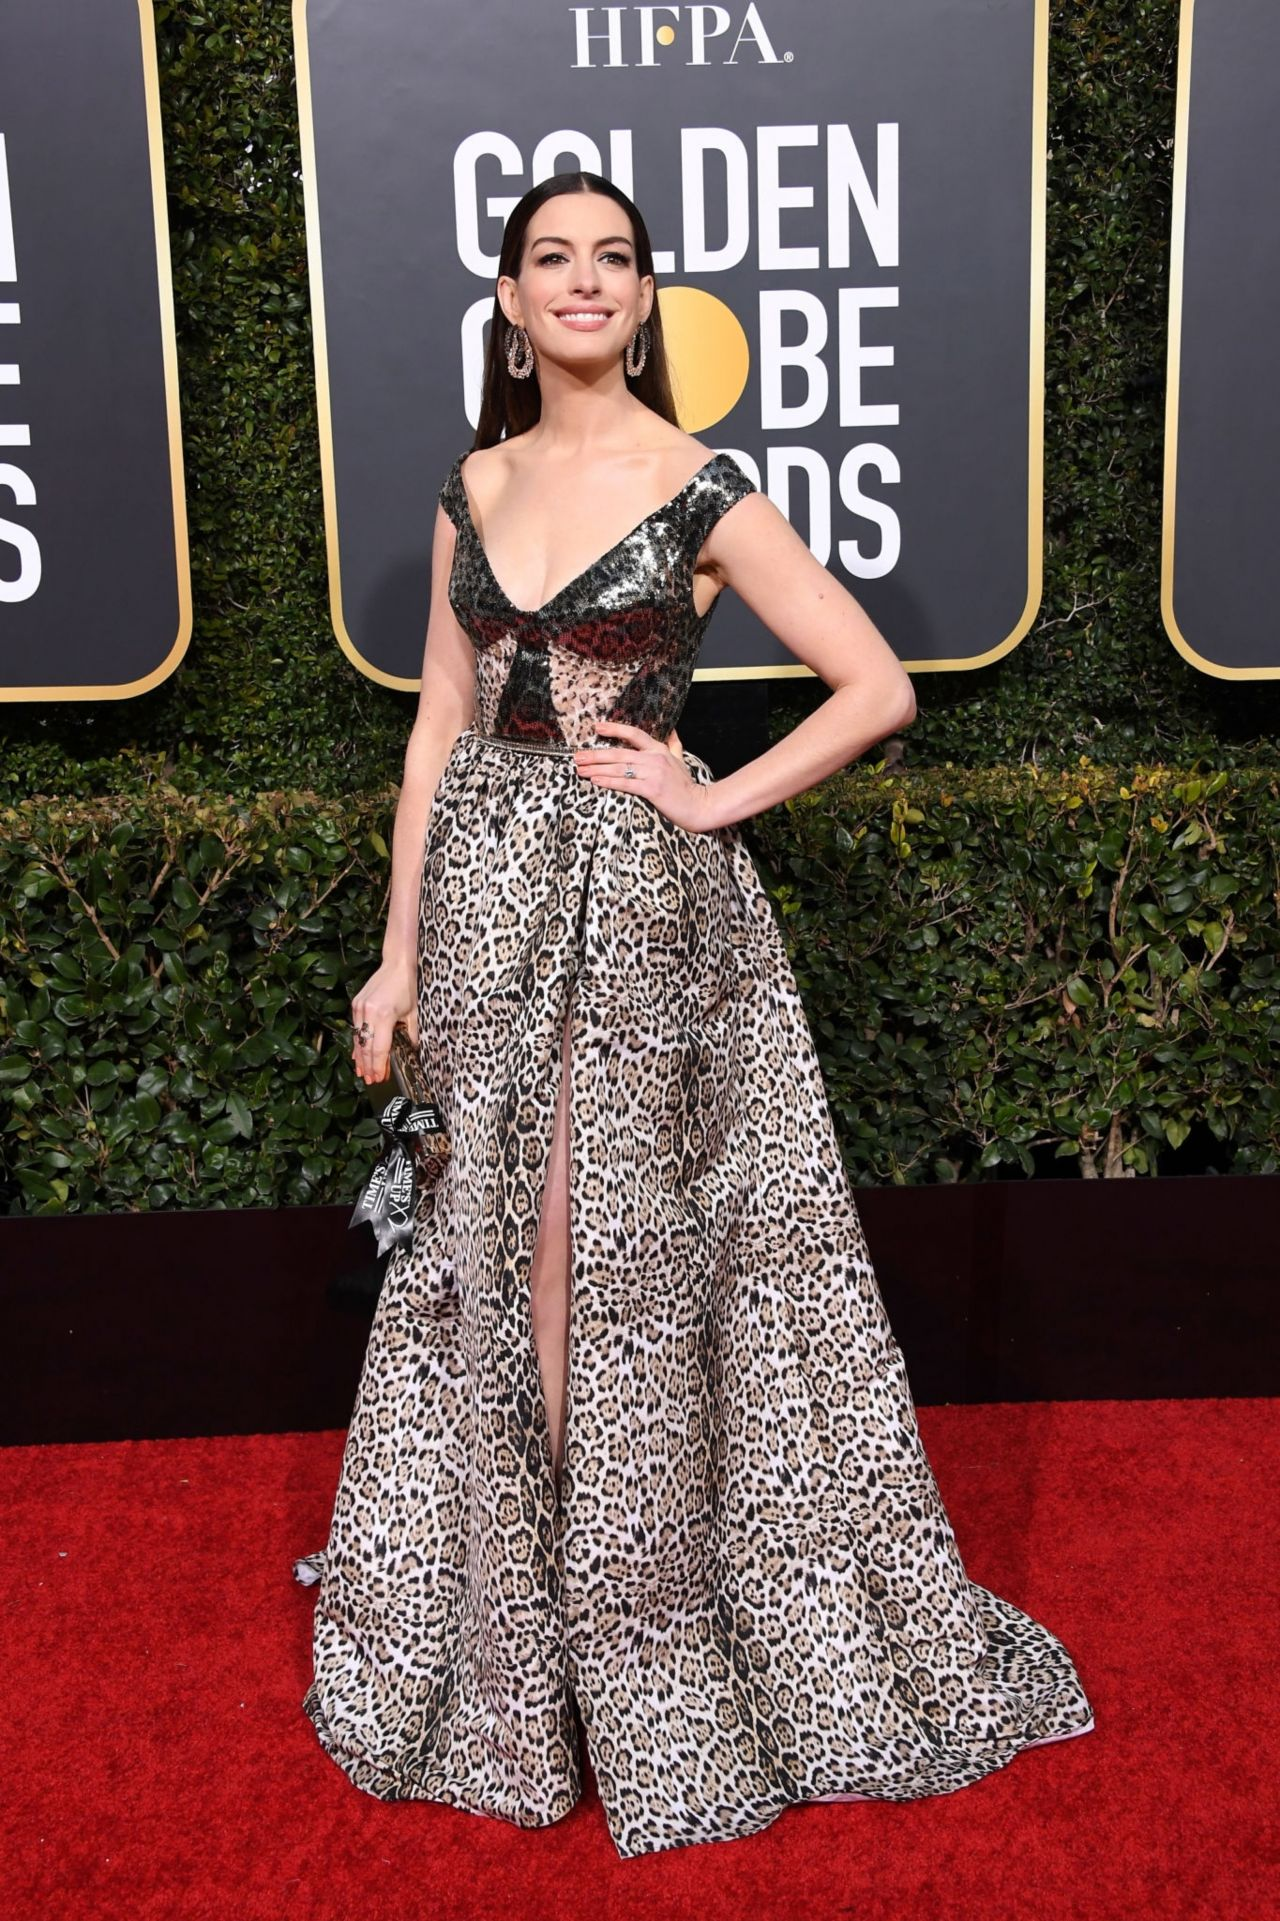 Anne Hathaway 2019 Golden Globe Awards Red Carpet